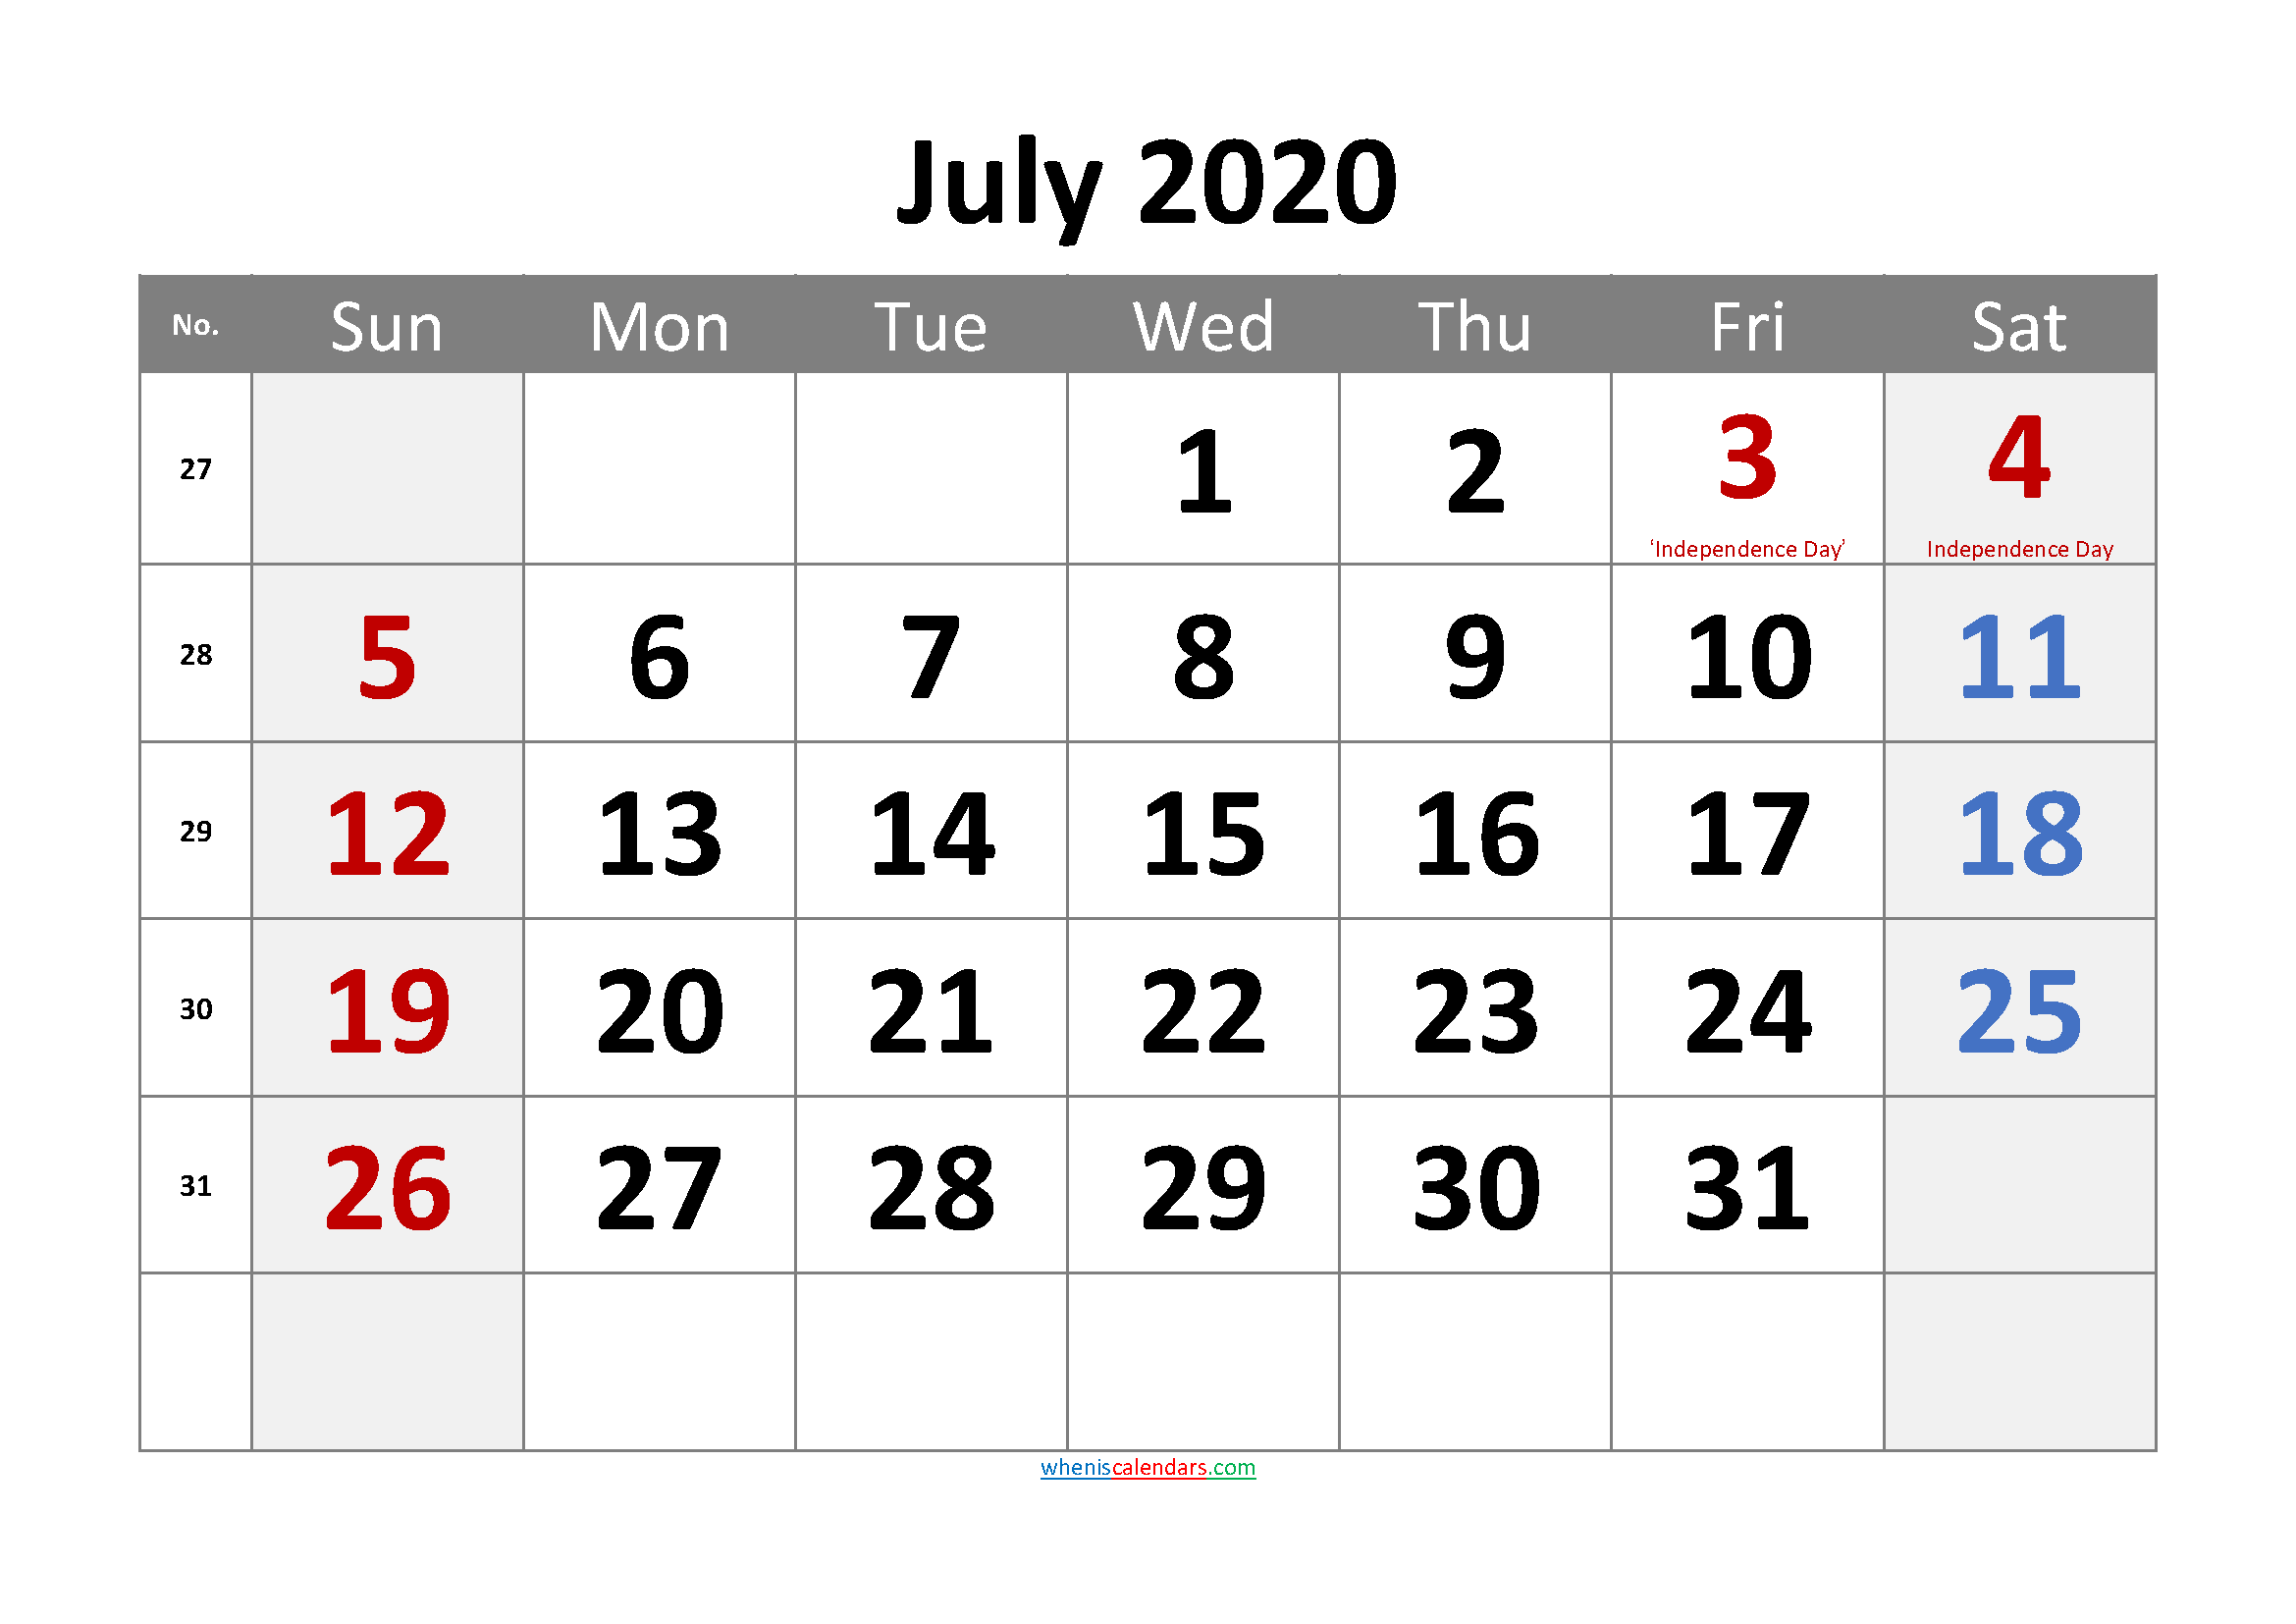 July 2020 Printable Calendar with Holidays